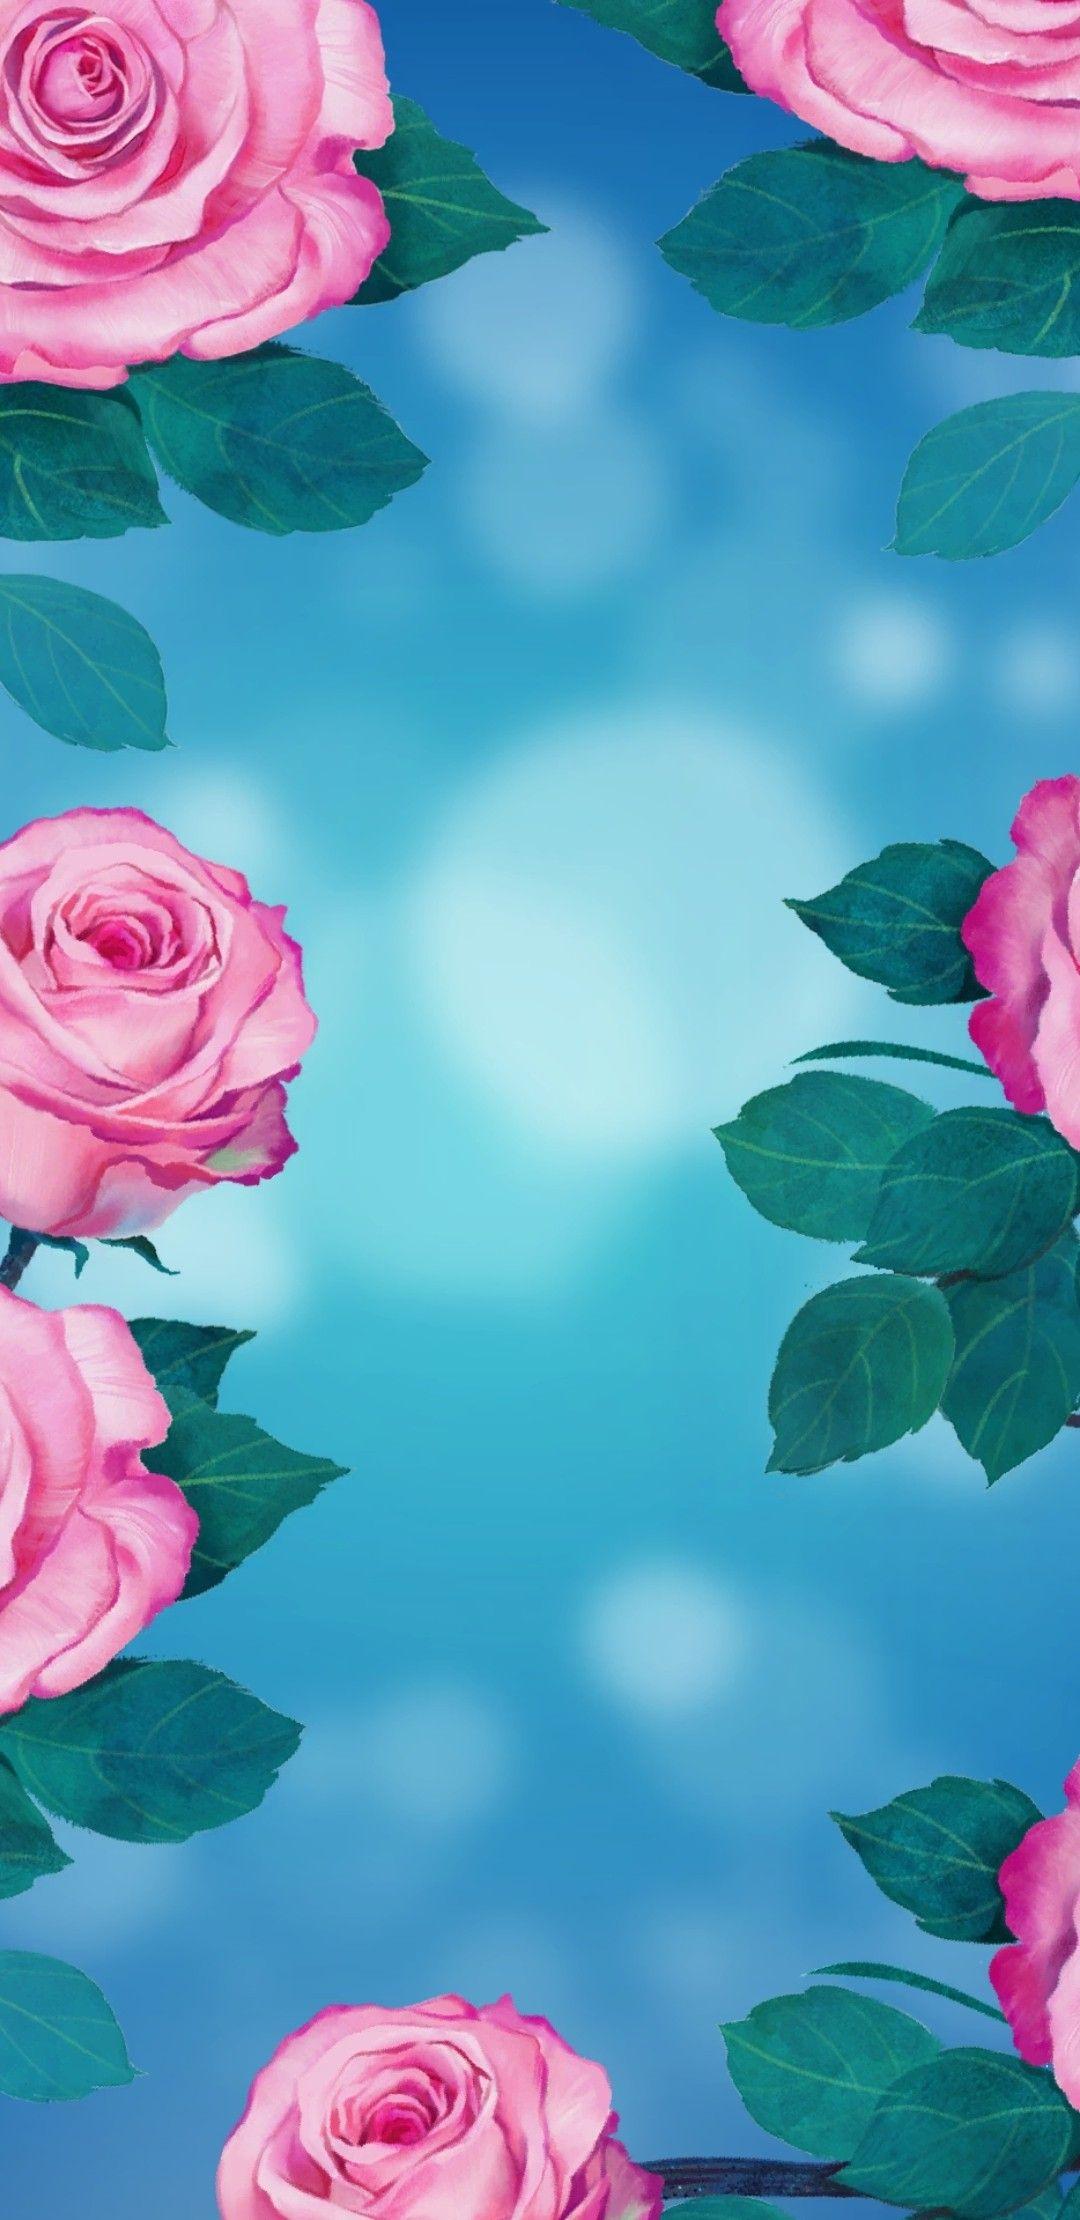 Phone Wallpaper Flowers Pink Blue Roses Iphone Wallpaper Flower Wallpaper Rose Wallpaper